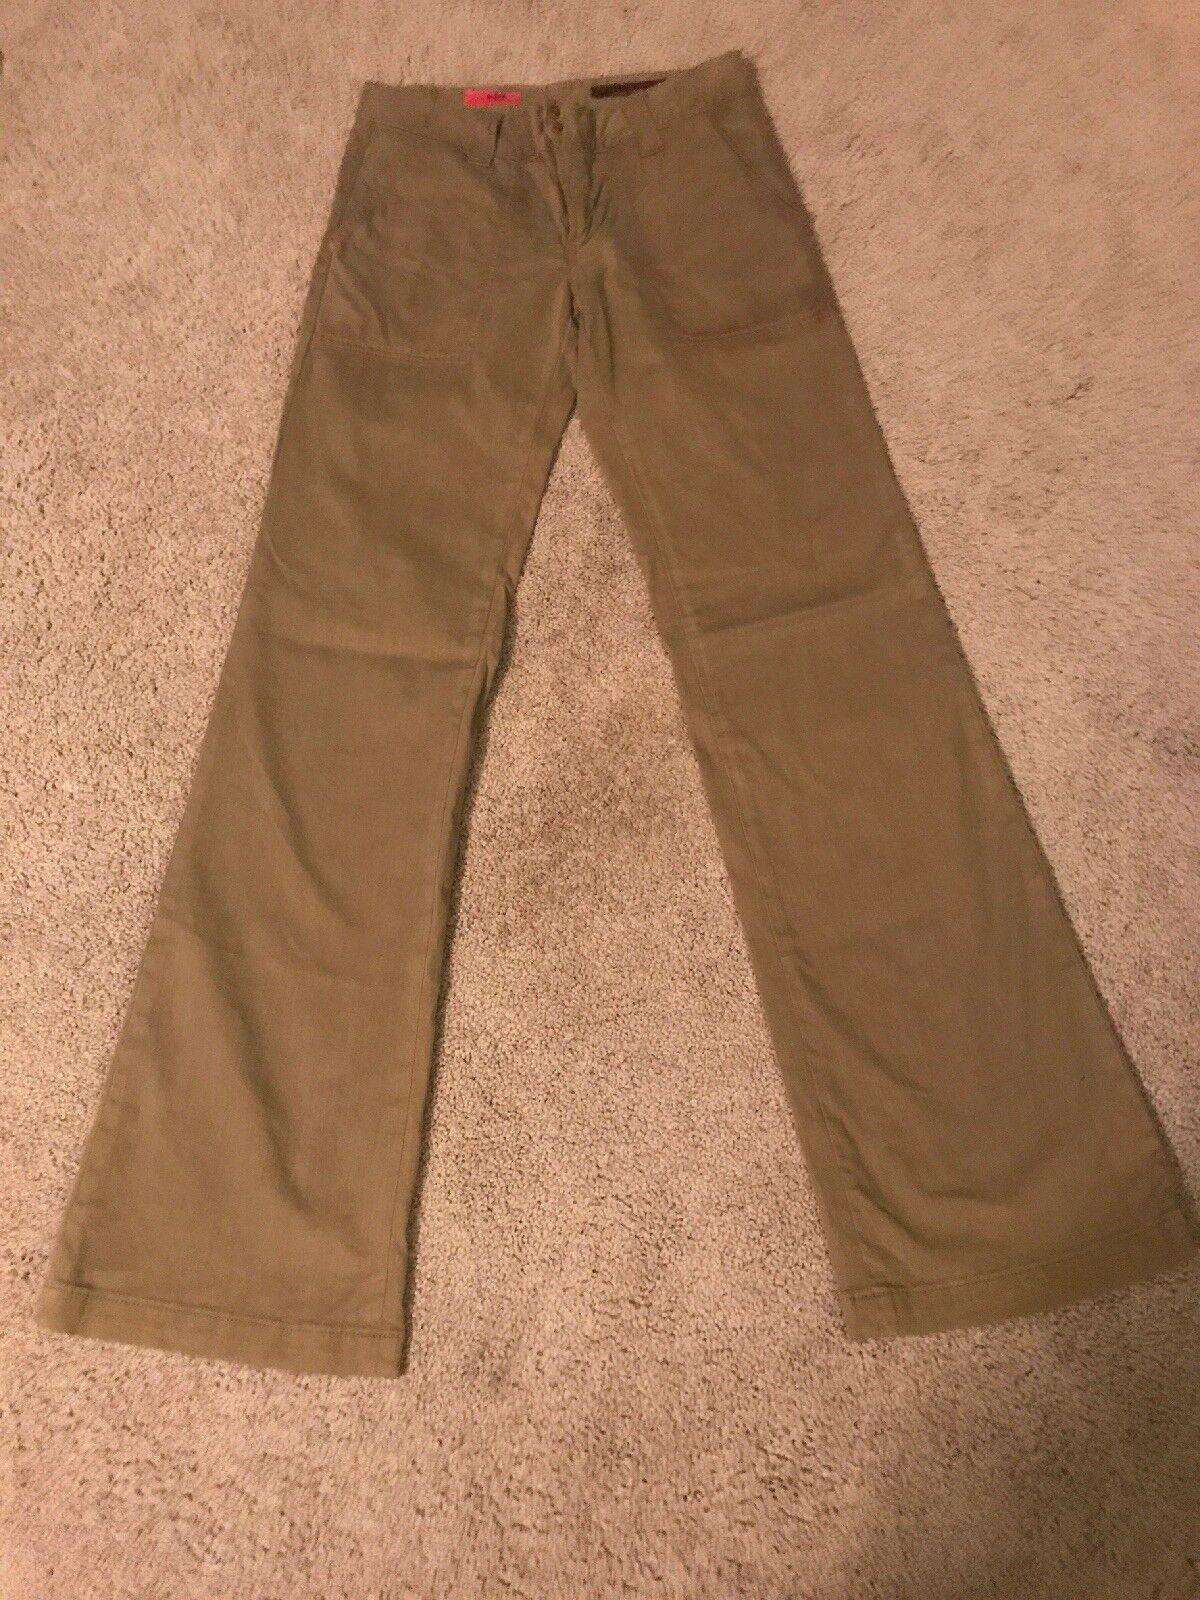 Size 27 AG ADRIANO goldSCHMIED The Joy Wide Leg Khaki Green Pants